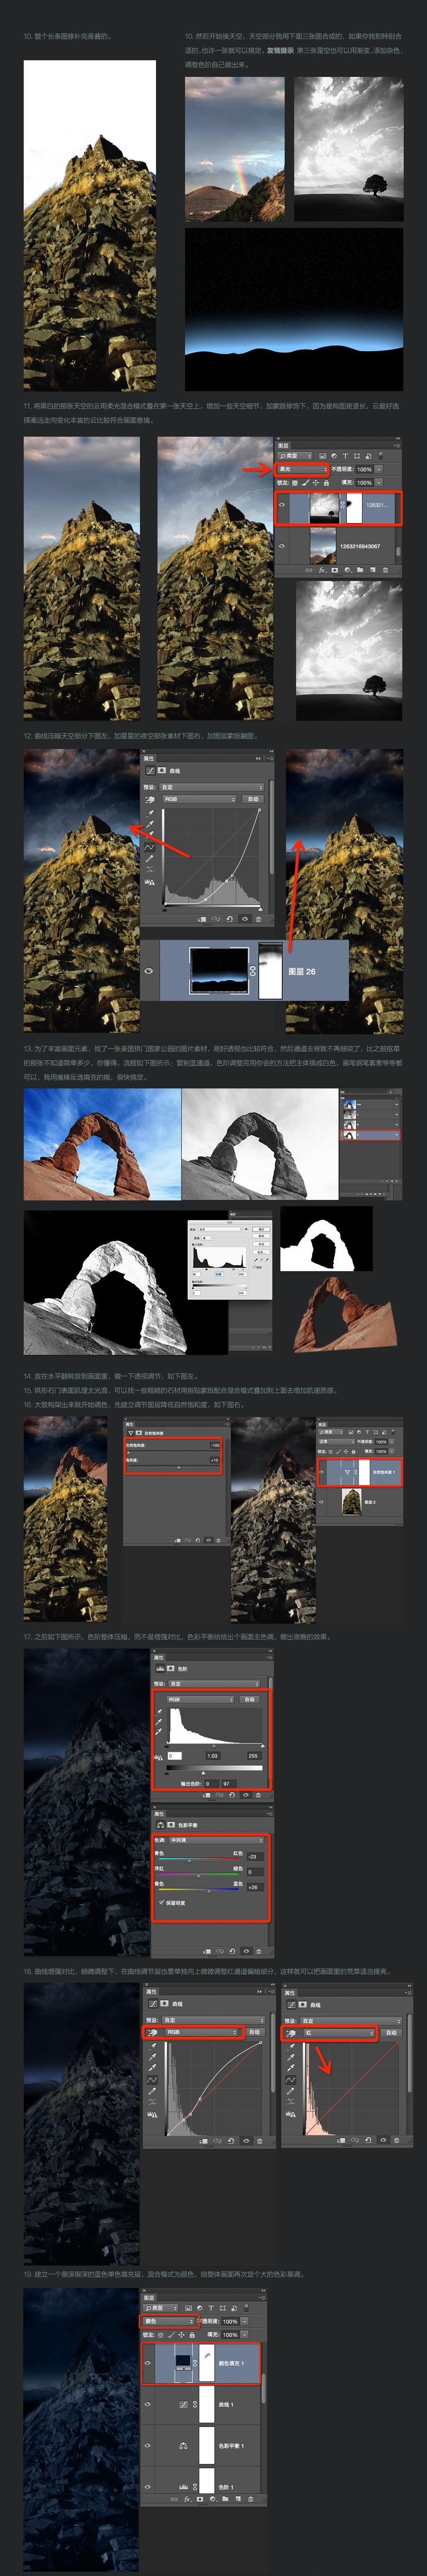 Photoshop合成废墟山顶洞穴场景效果图